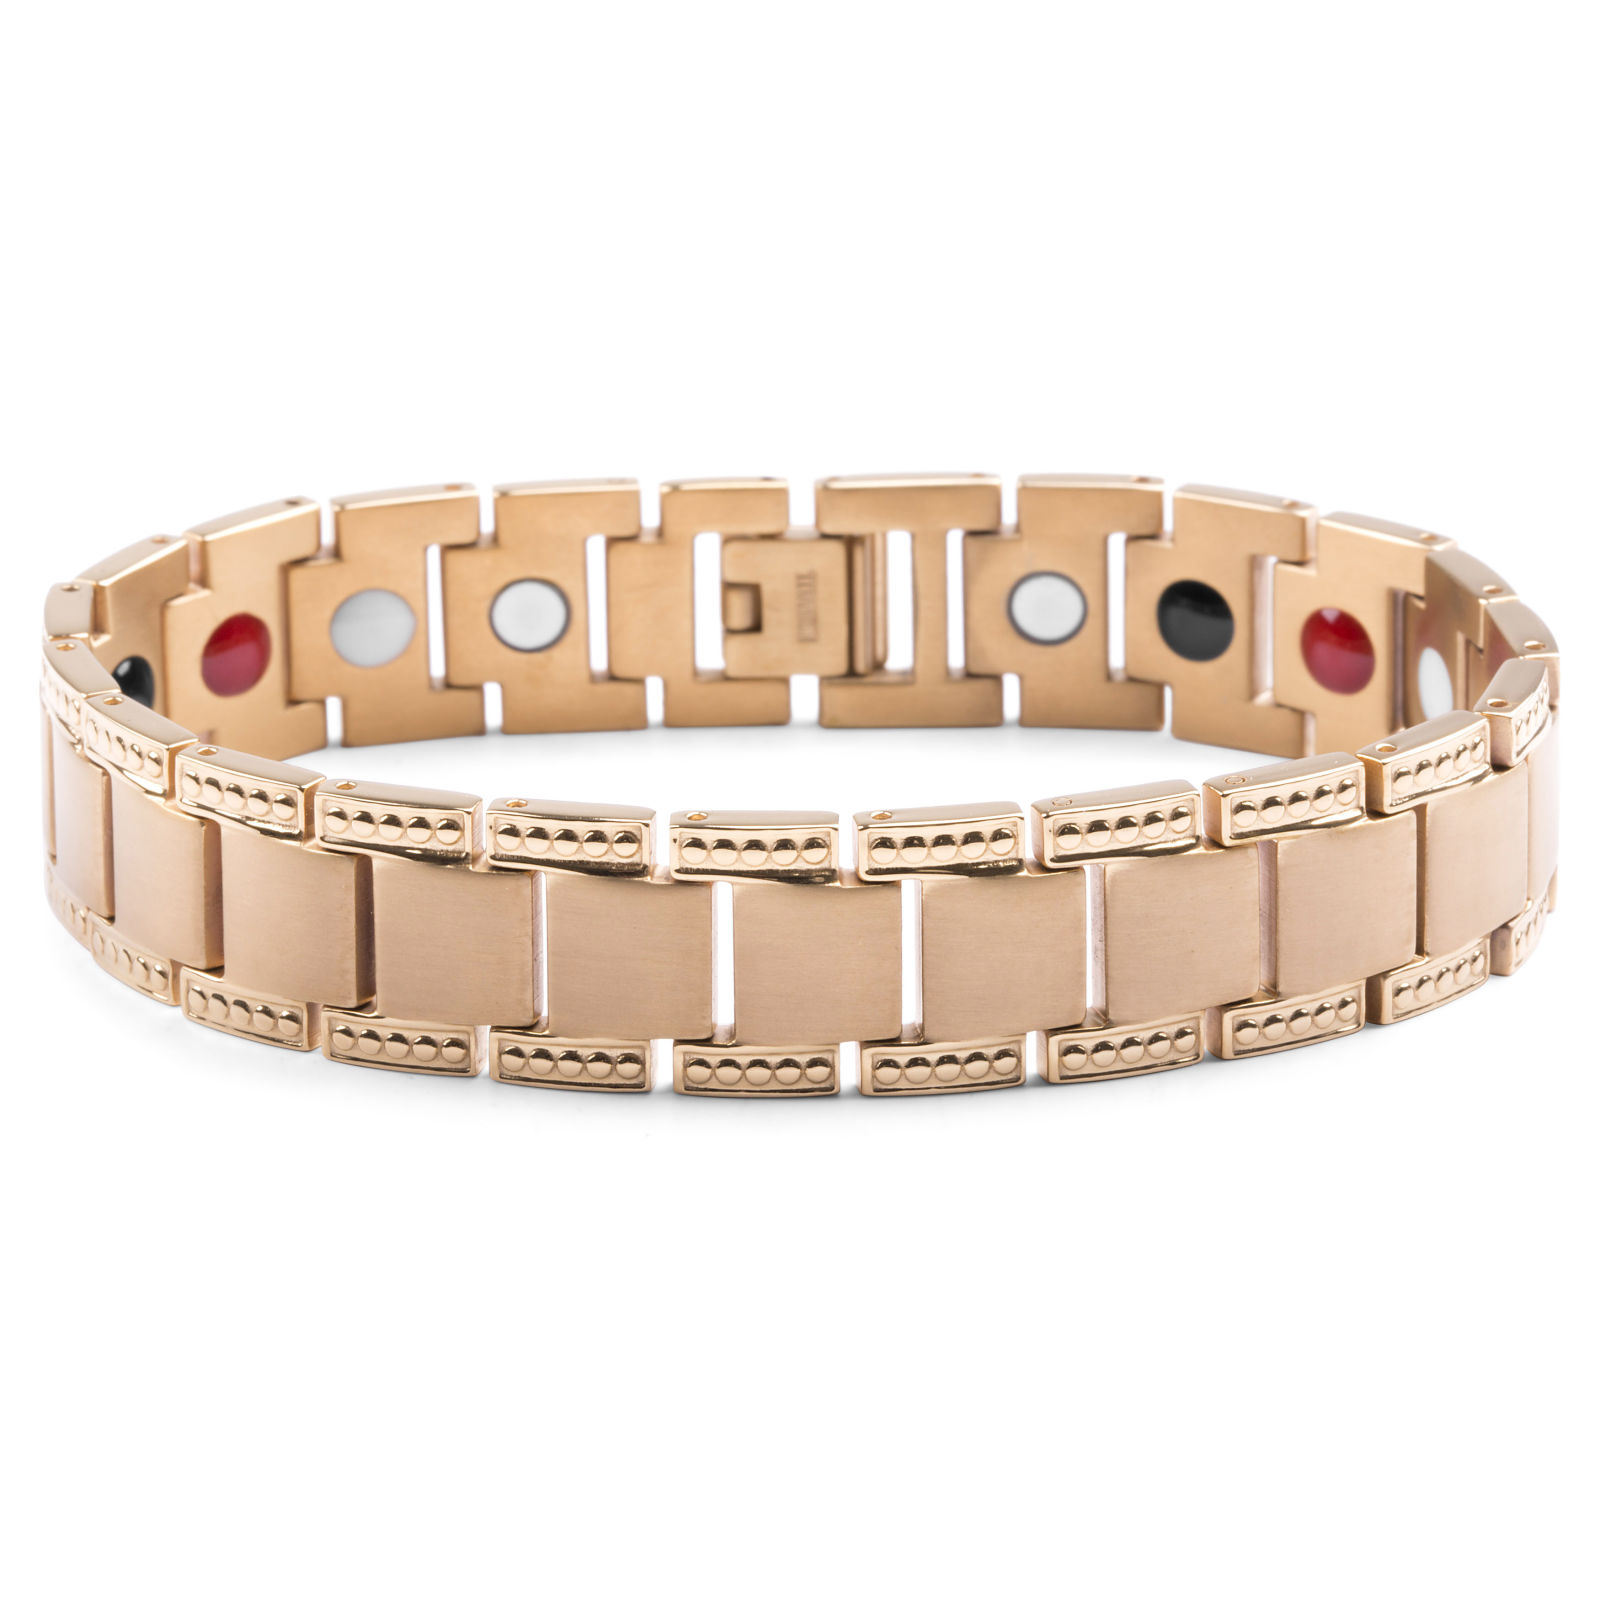 Gold Healing Titanium Steel Bracelet Trendhim iis7s